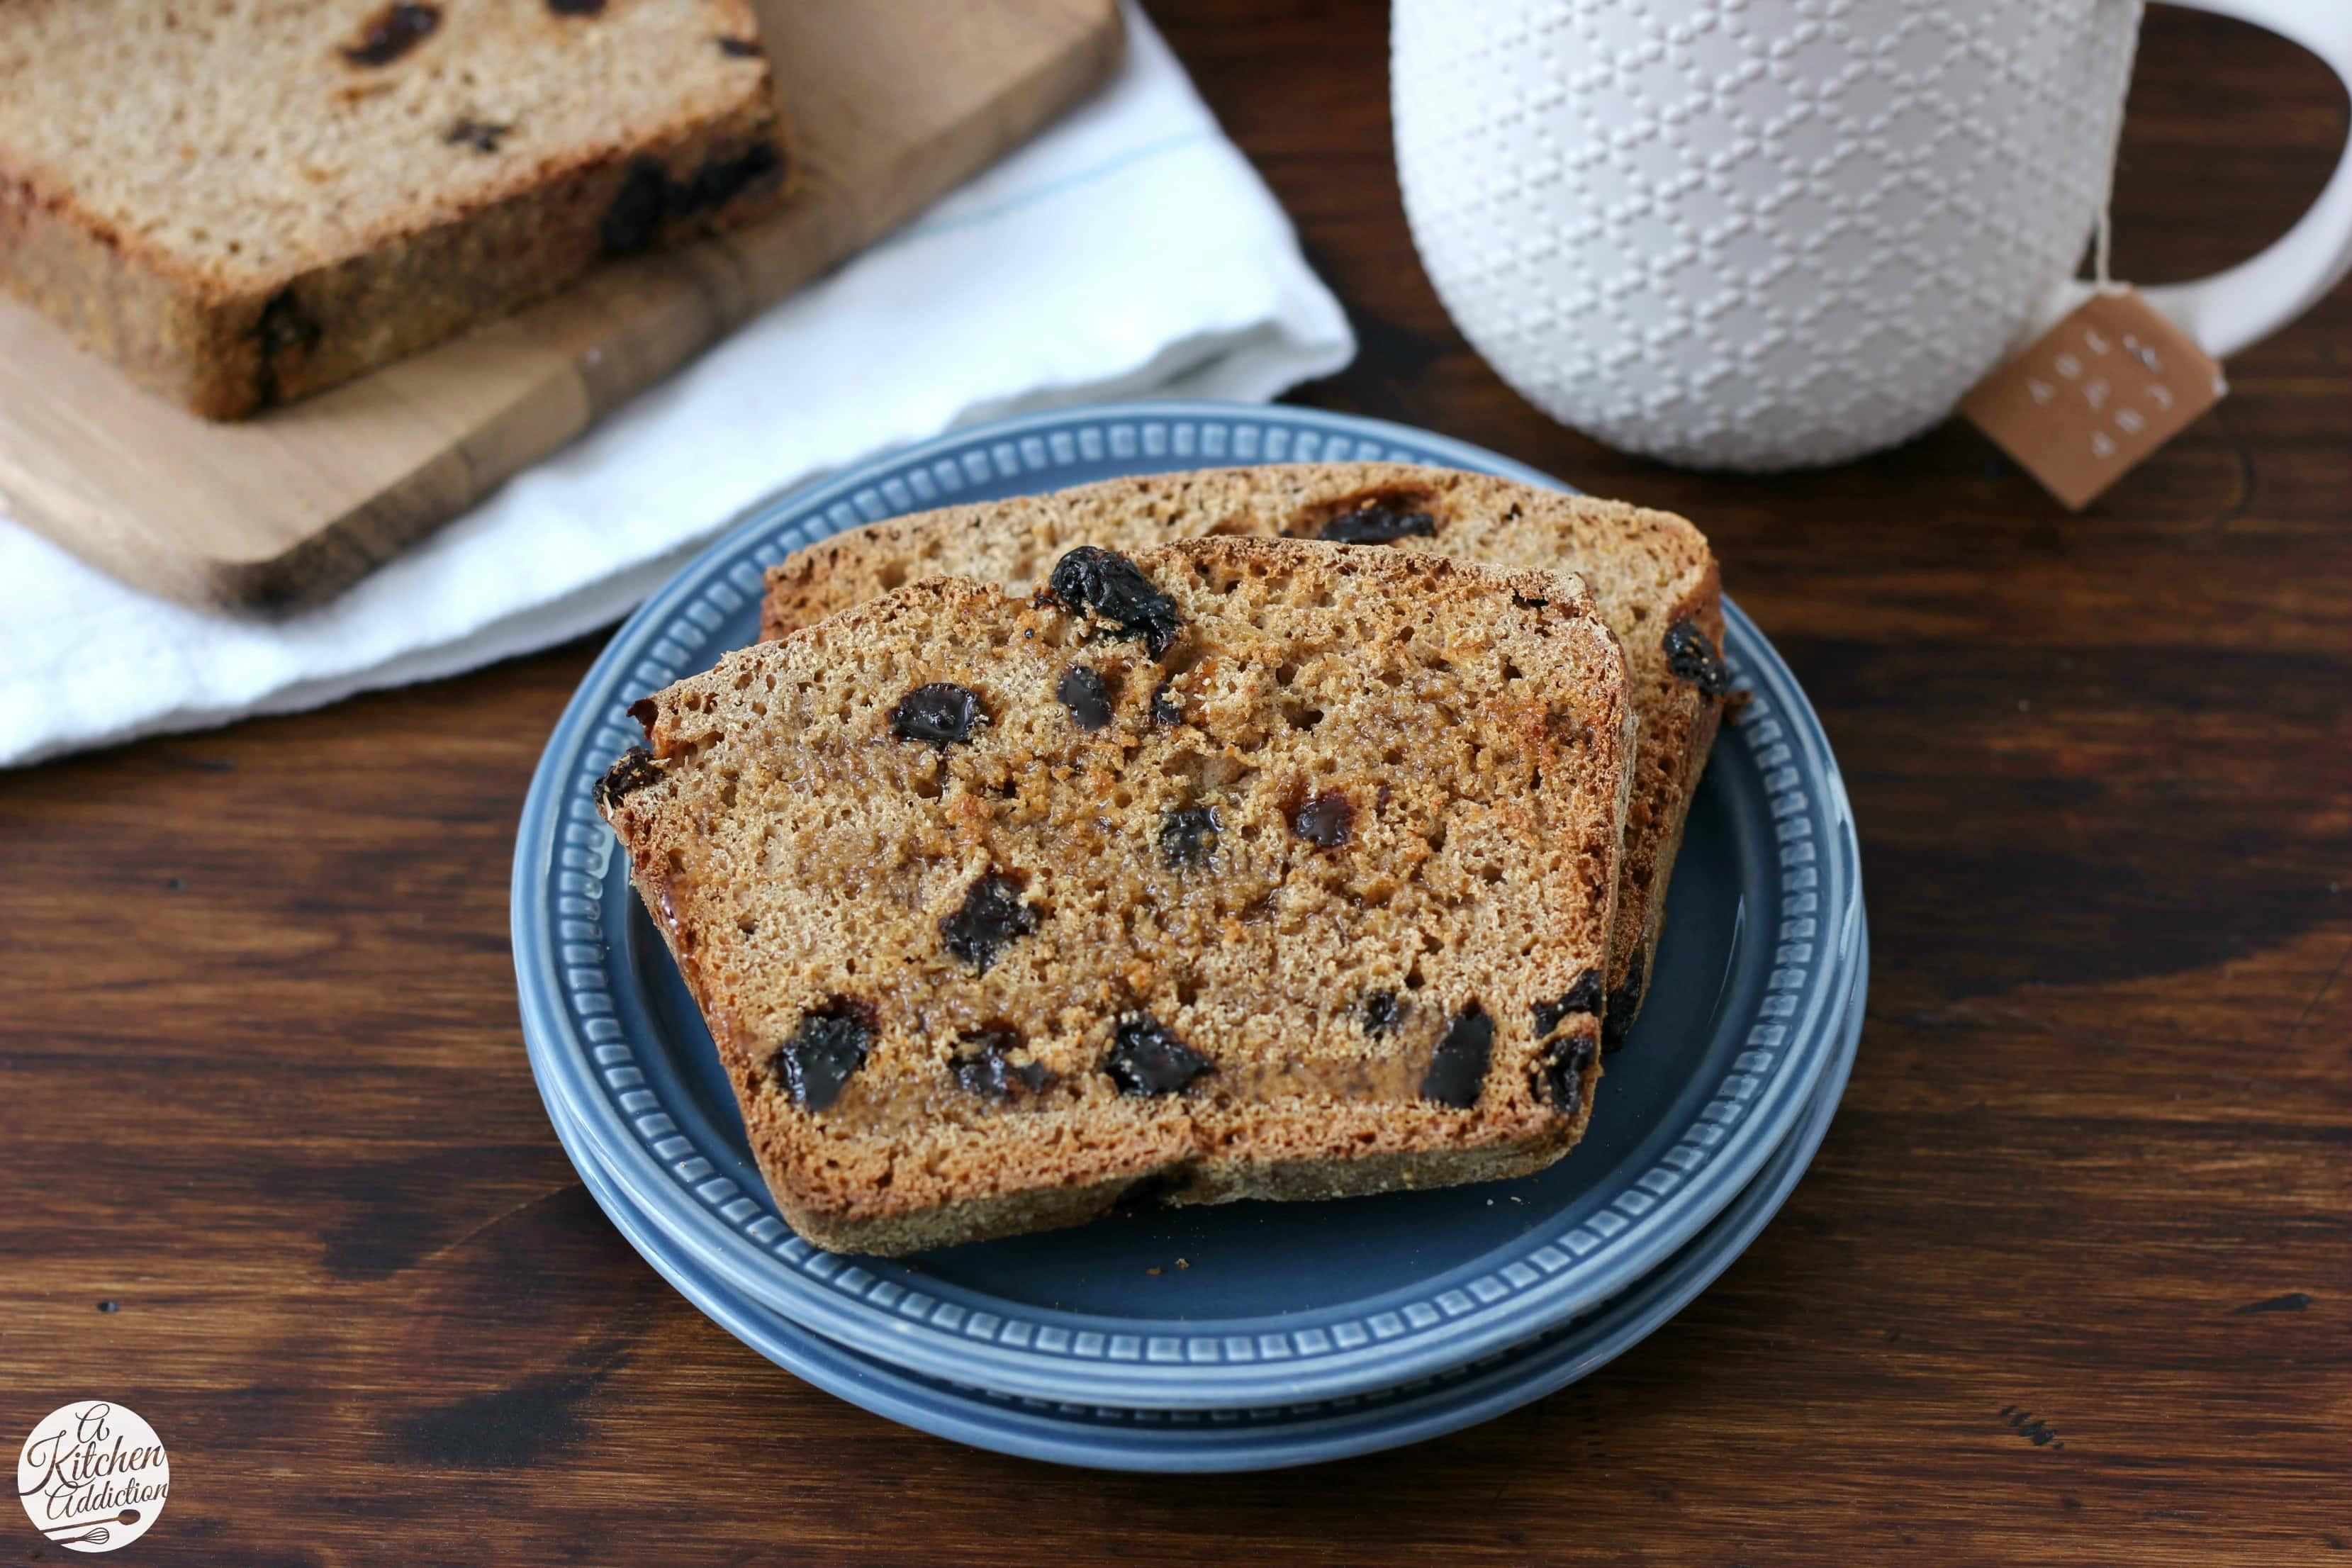 Easy Cinnamon Raisin Honey Wheat English Muffin Bread Recipe from A Kitchen Addiction